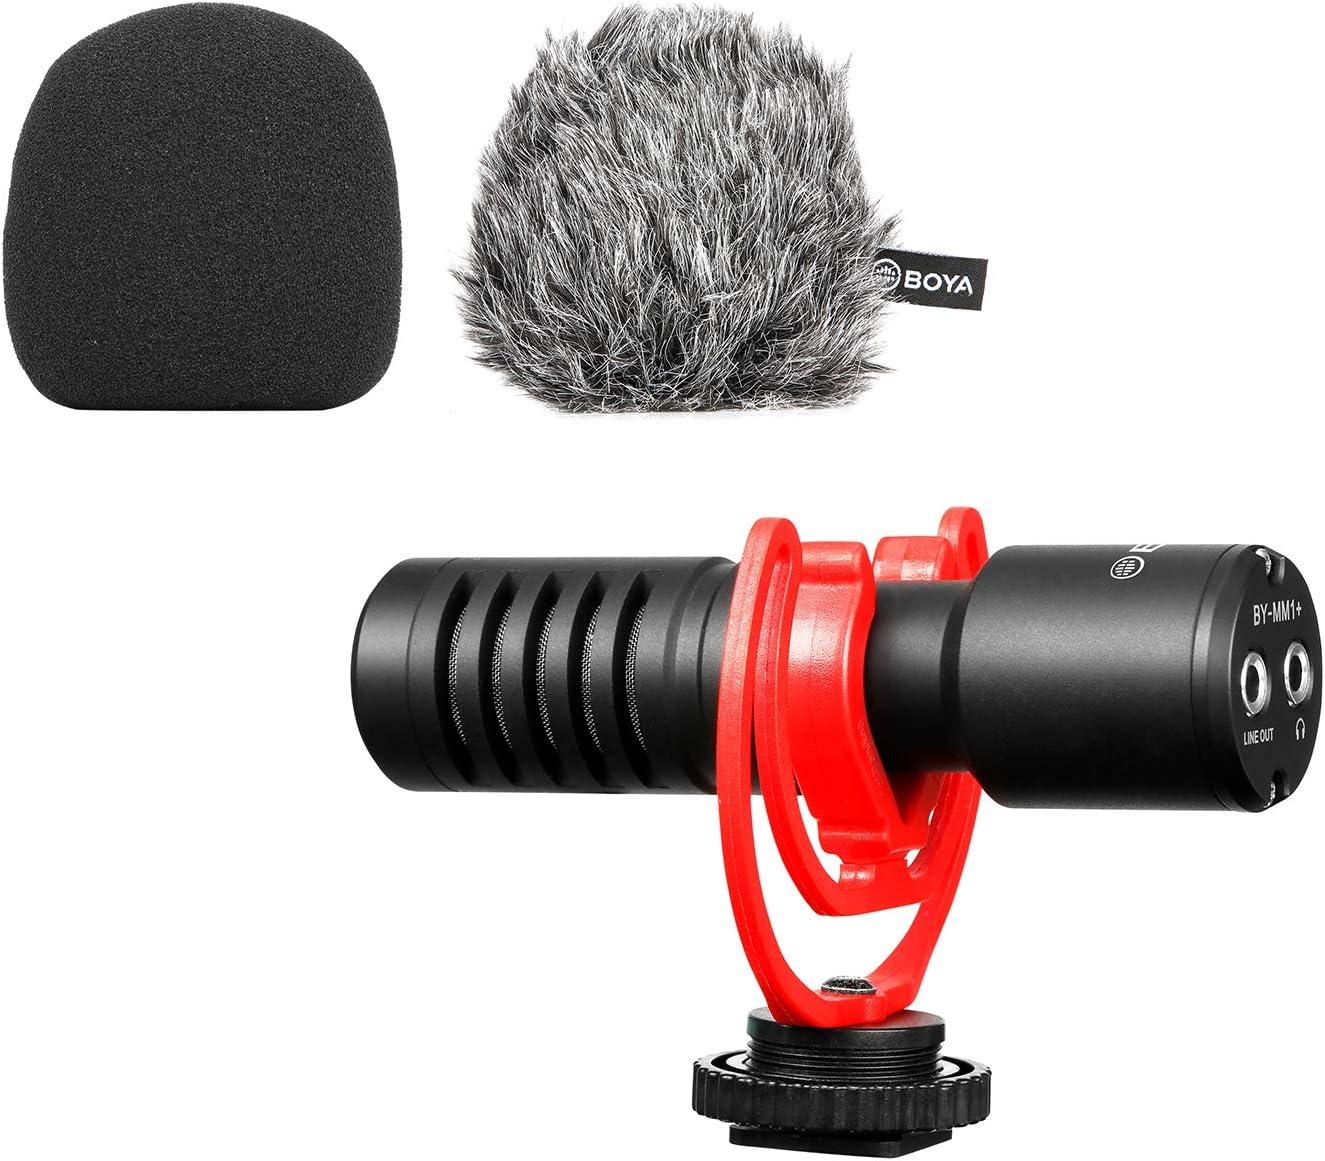 BOYA Spasm price Super-Cardioid Shotgun Microphone Mic BY-MM1+ Stereo Max 90% OFF Mini